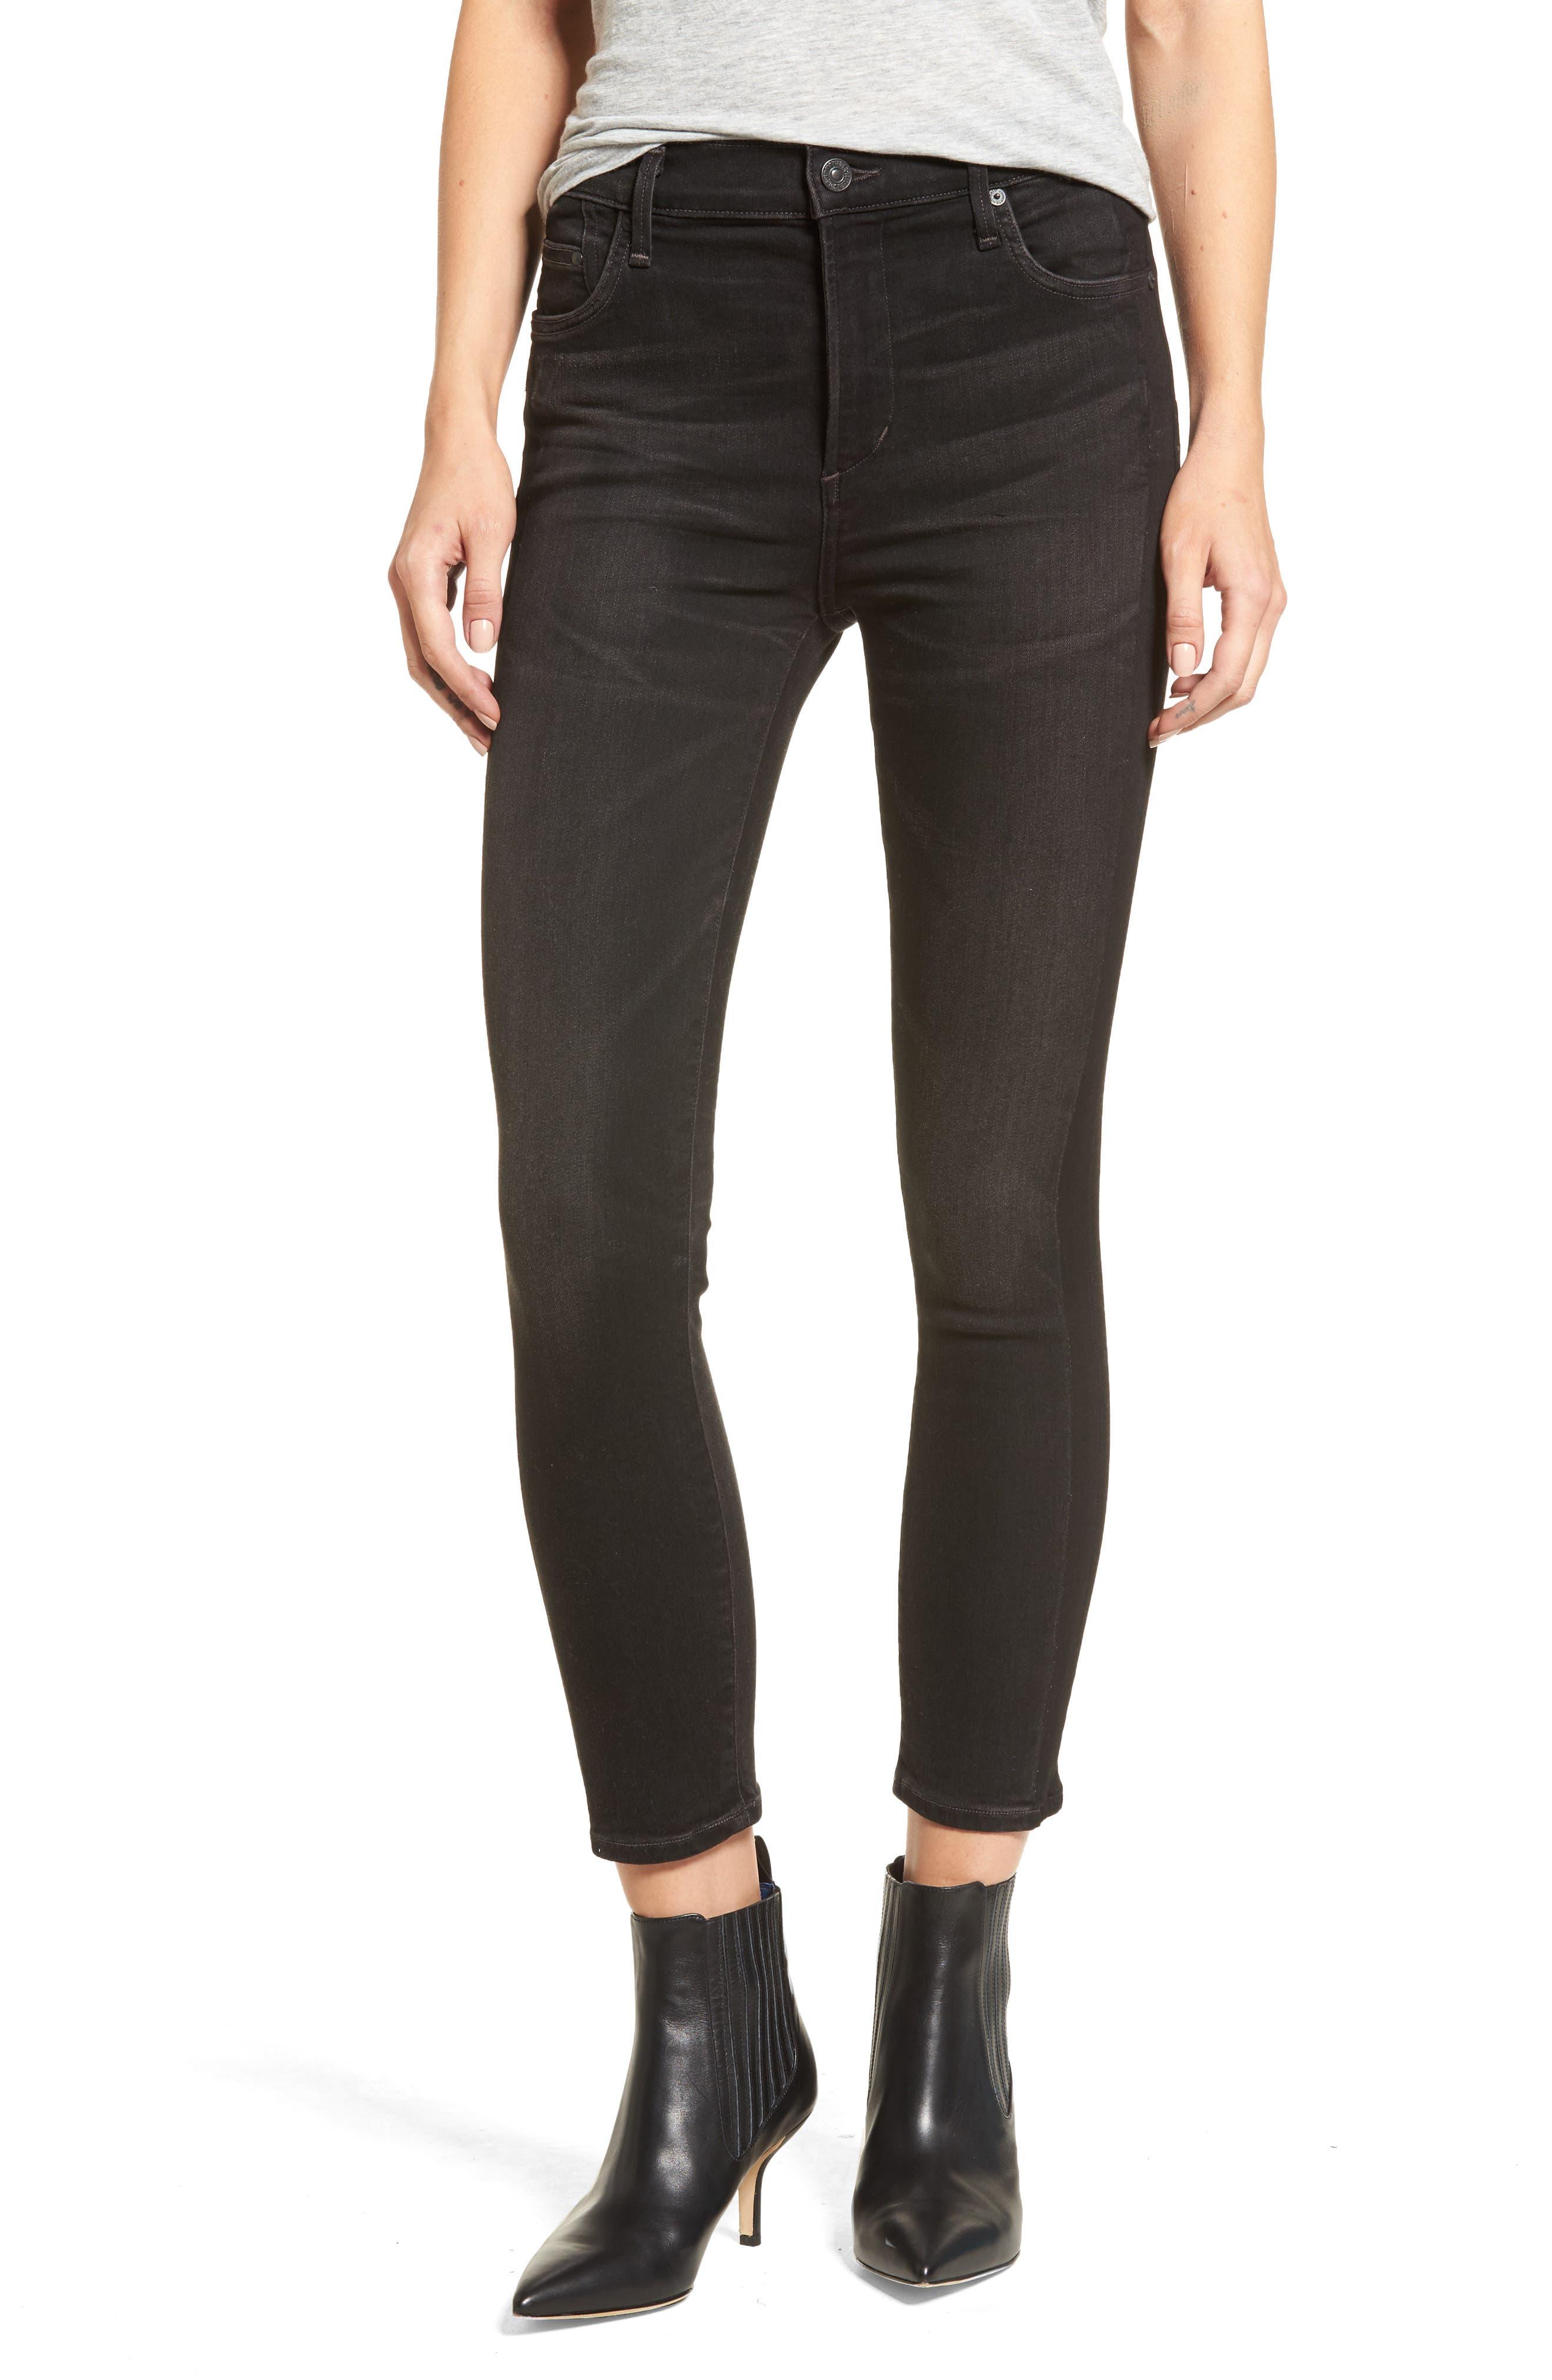 Rocket High Waist Crop Skinny Jeans,                             Main thumbnail 1, color,                             009